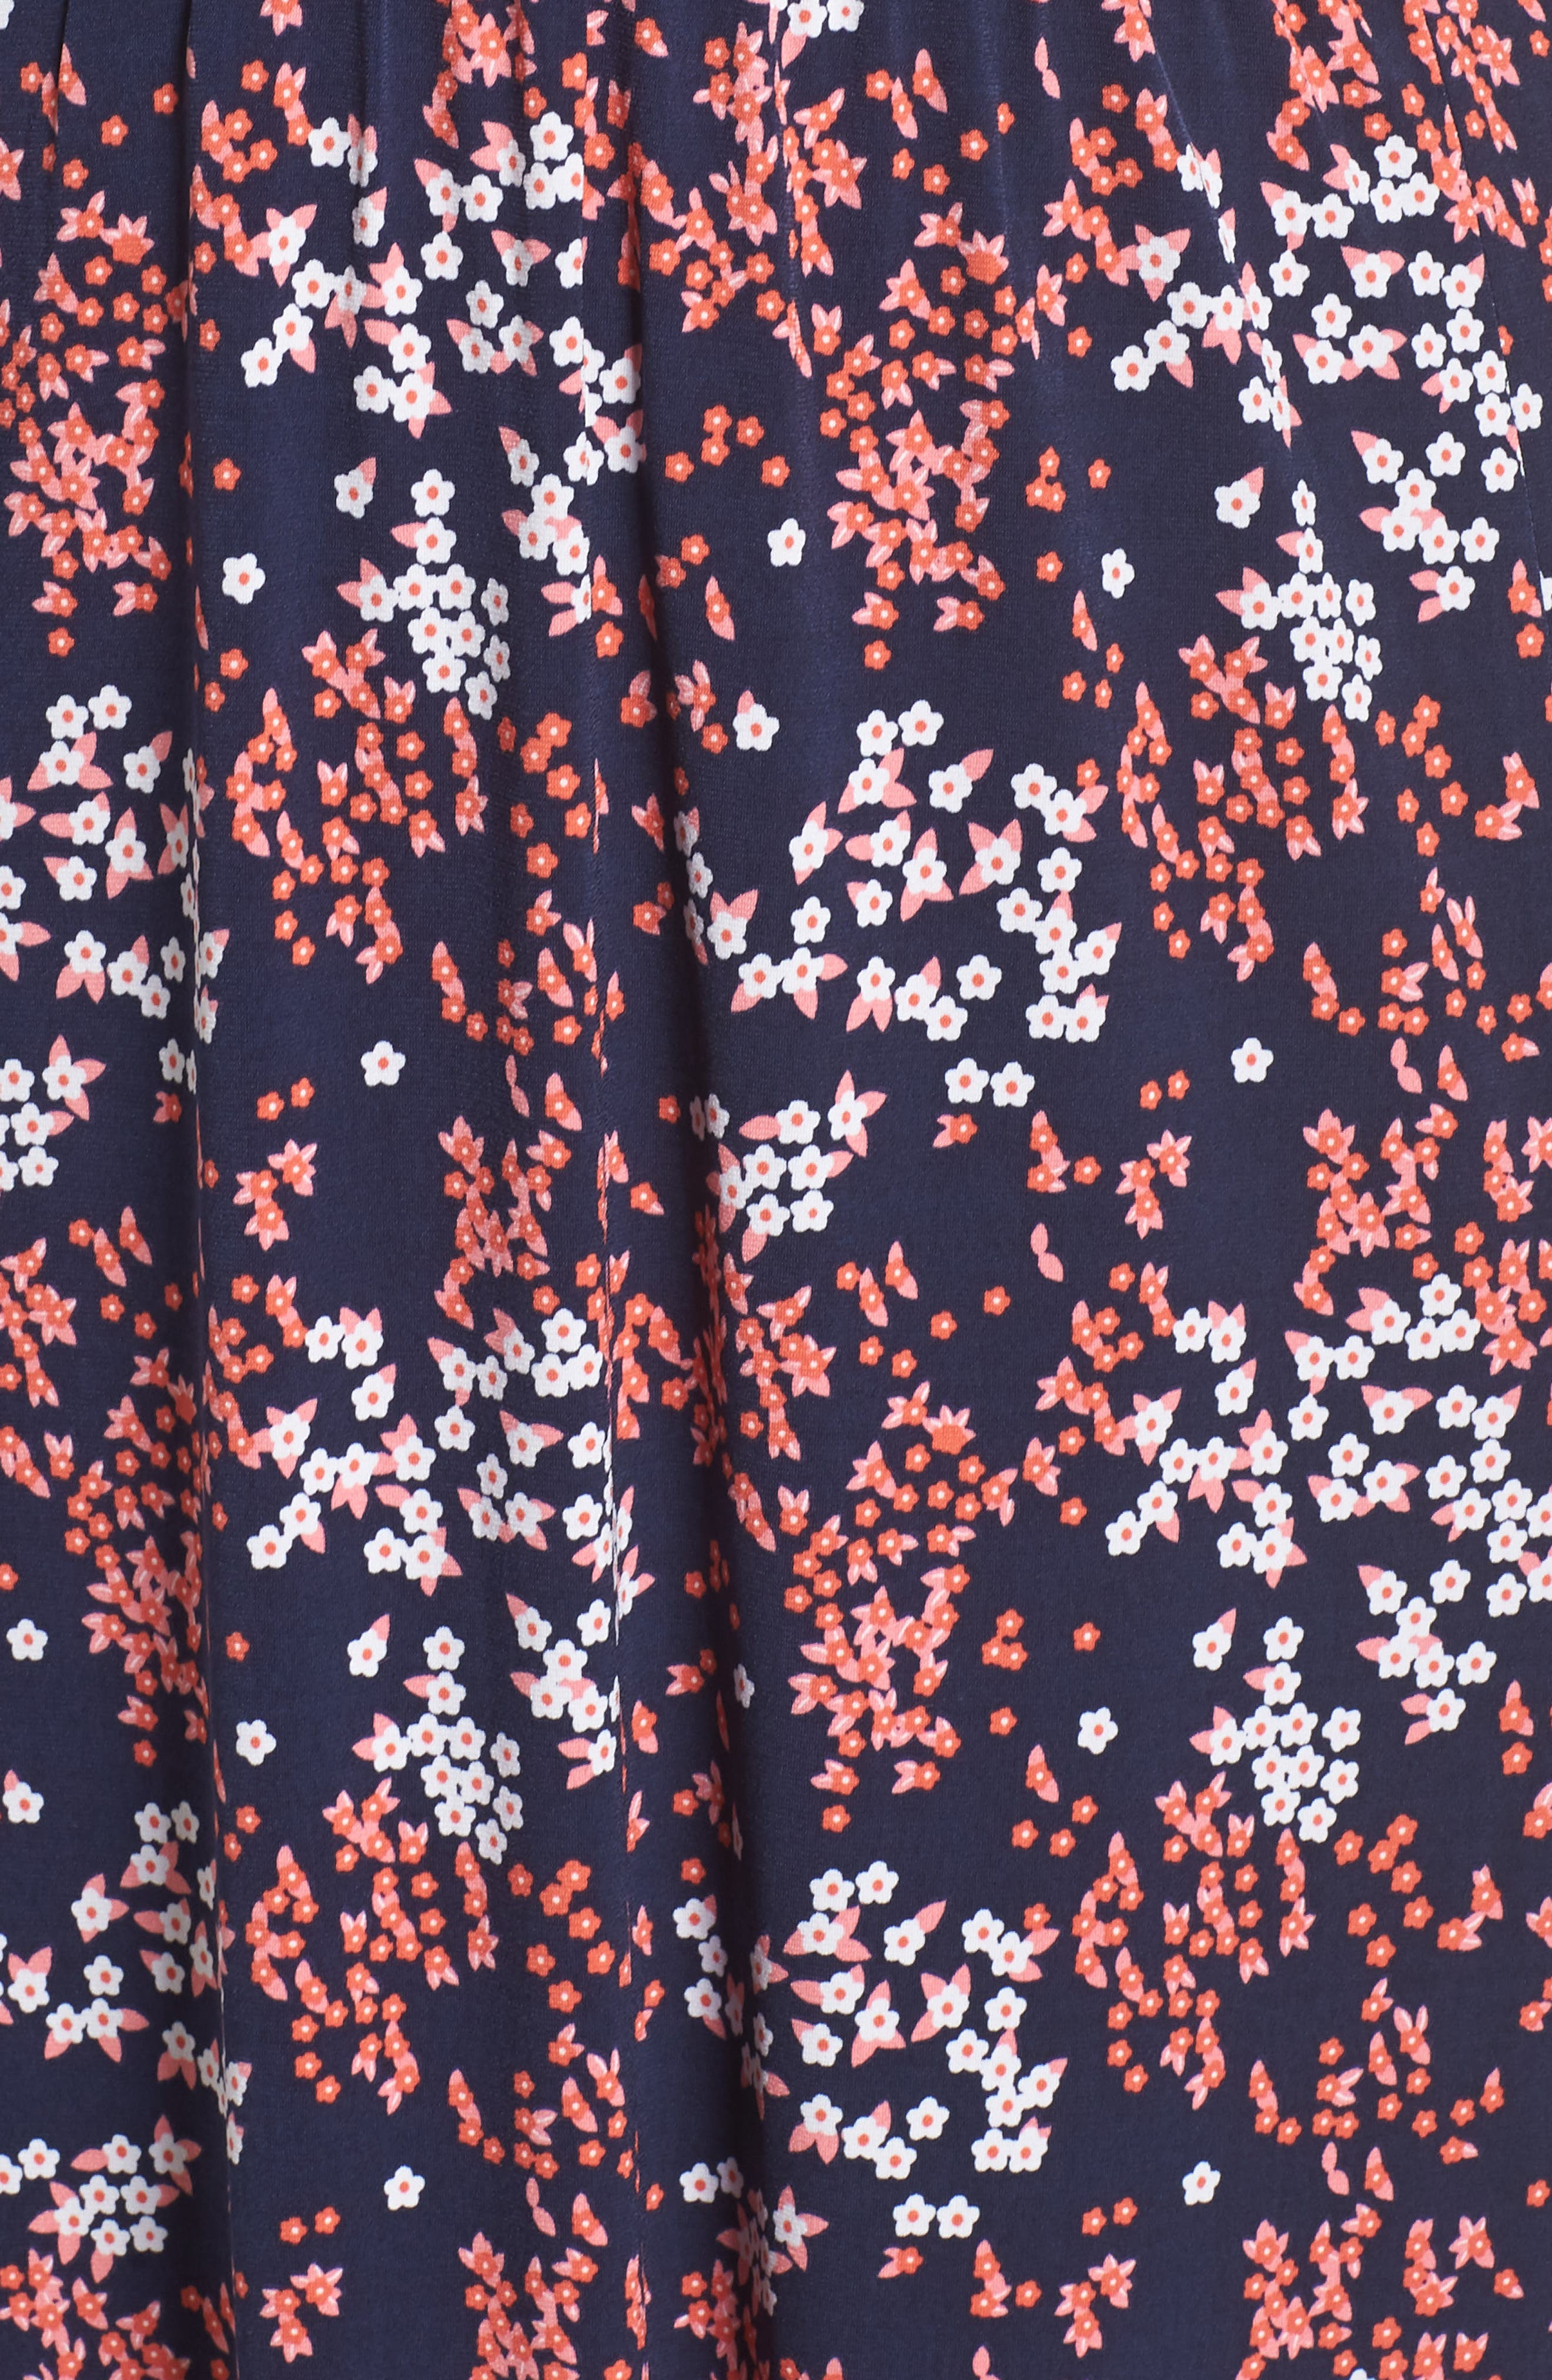 Floral Print Maxi Dress,                             Alternate thumbnail 6, color,                             671